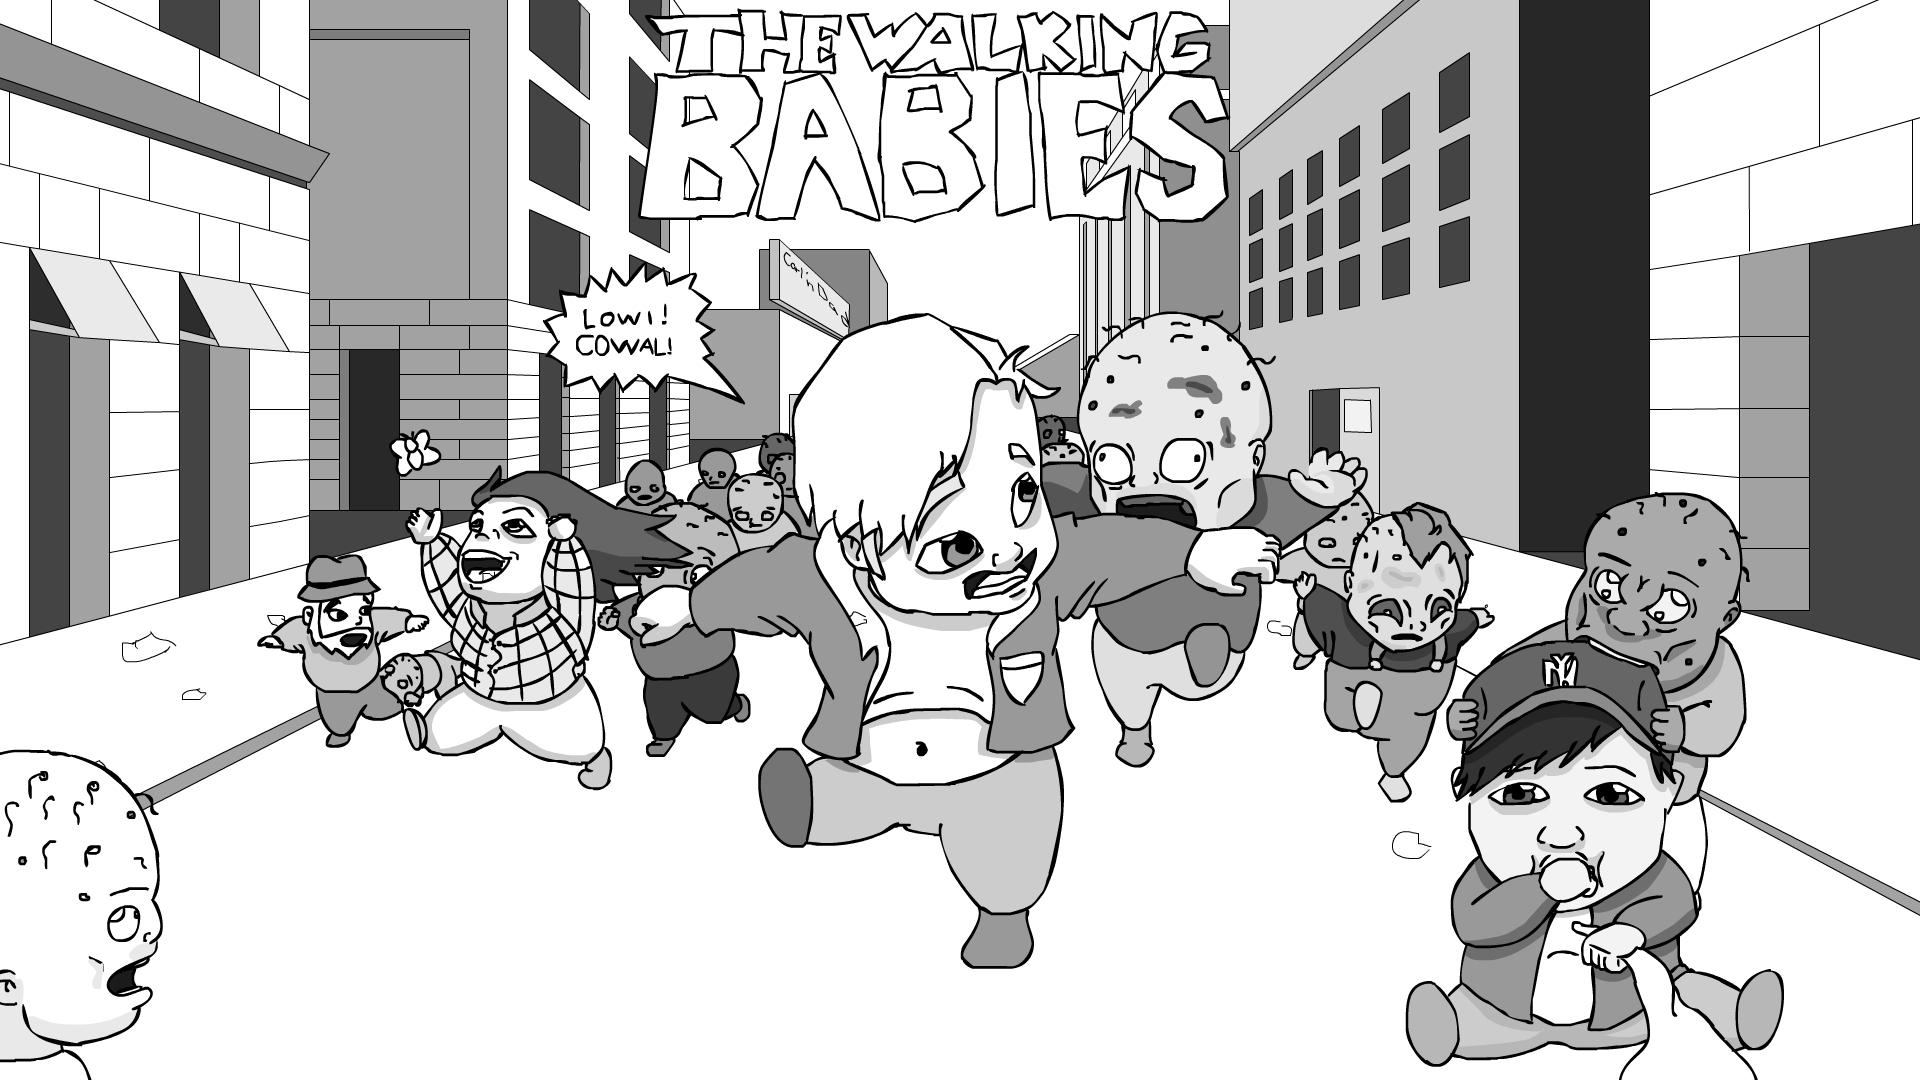 The walking babies